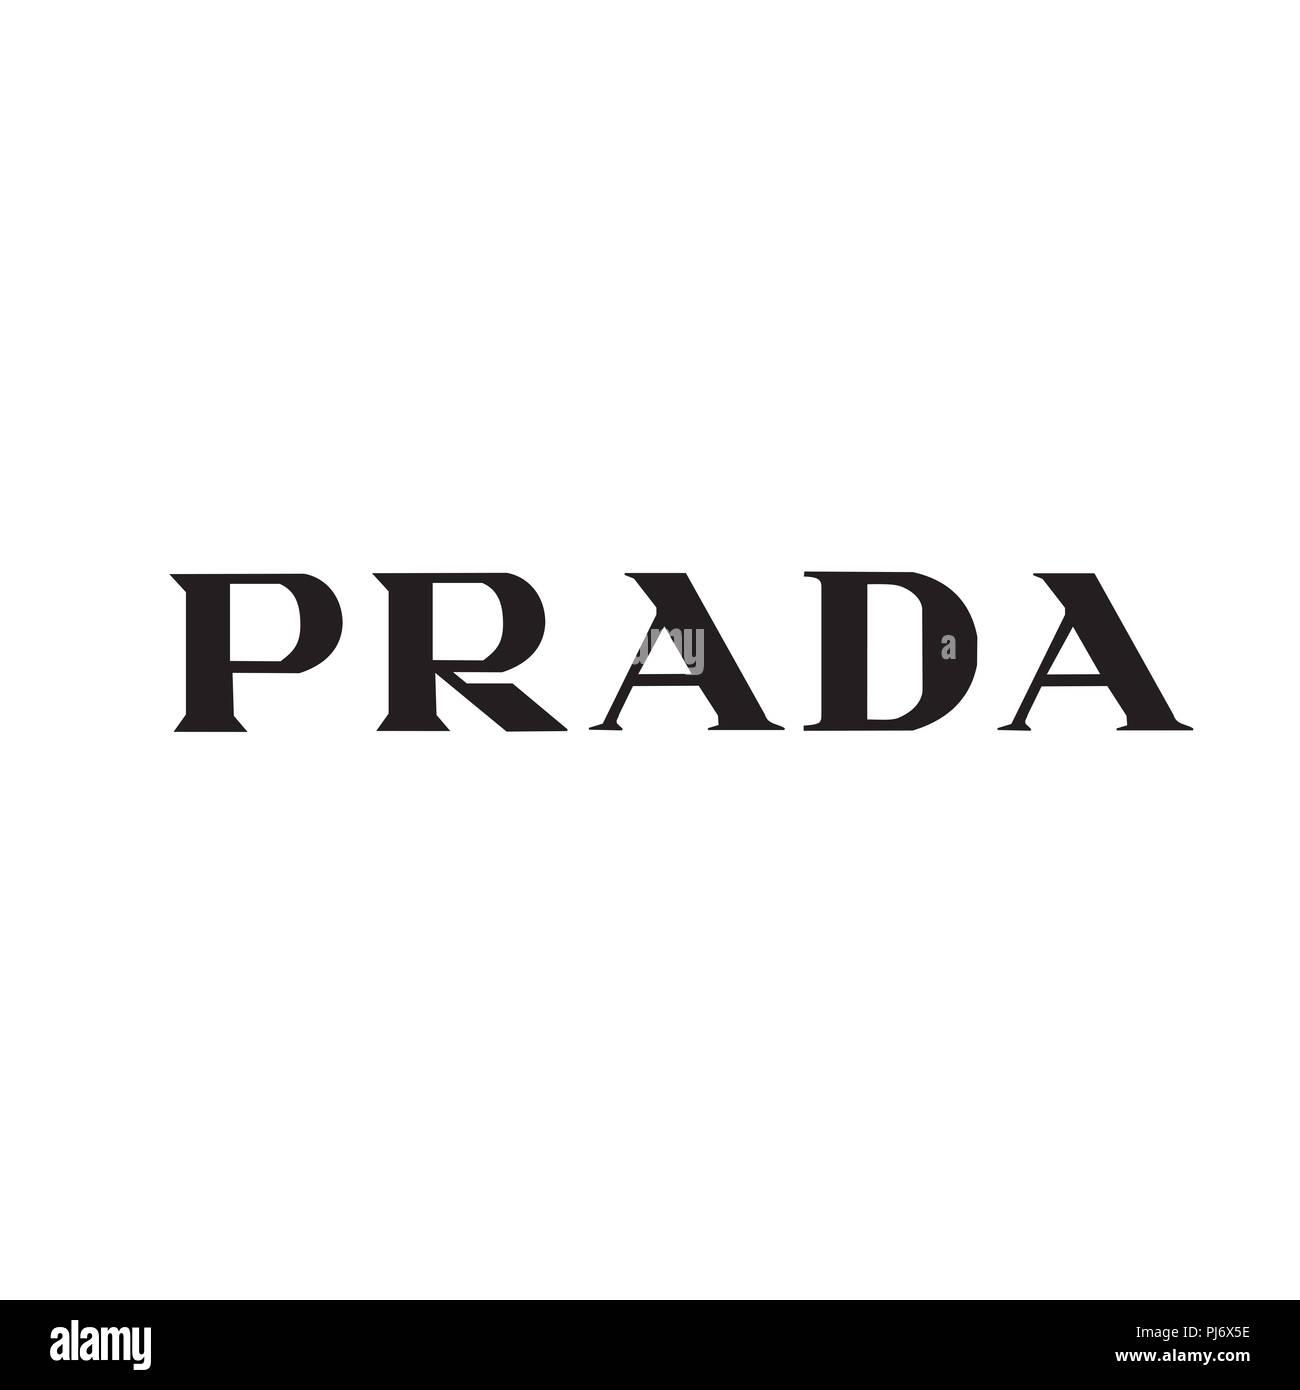 c59c1e28f43e7f PRADA-Logo fashion Luxus Marke Italien Kleidung Abbildung Stockfoto ...